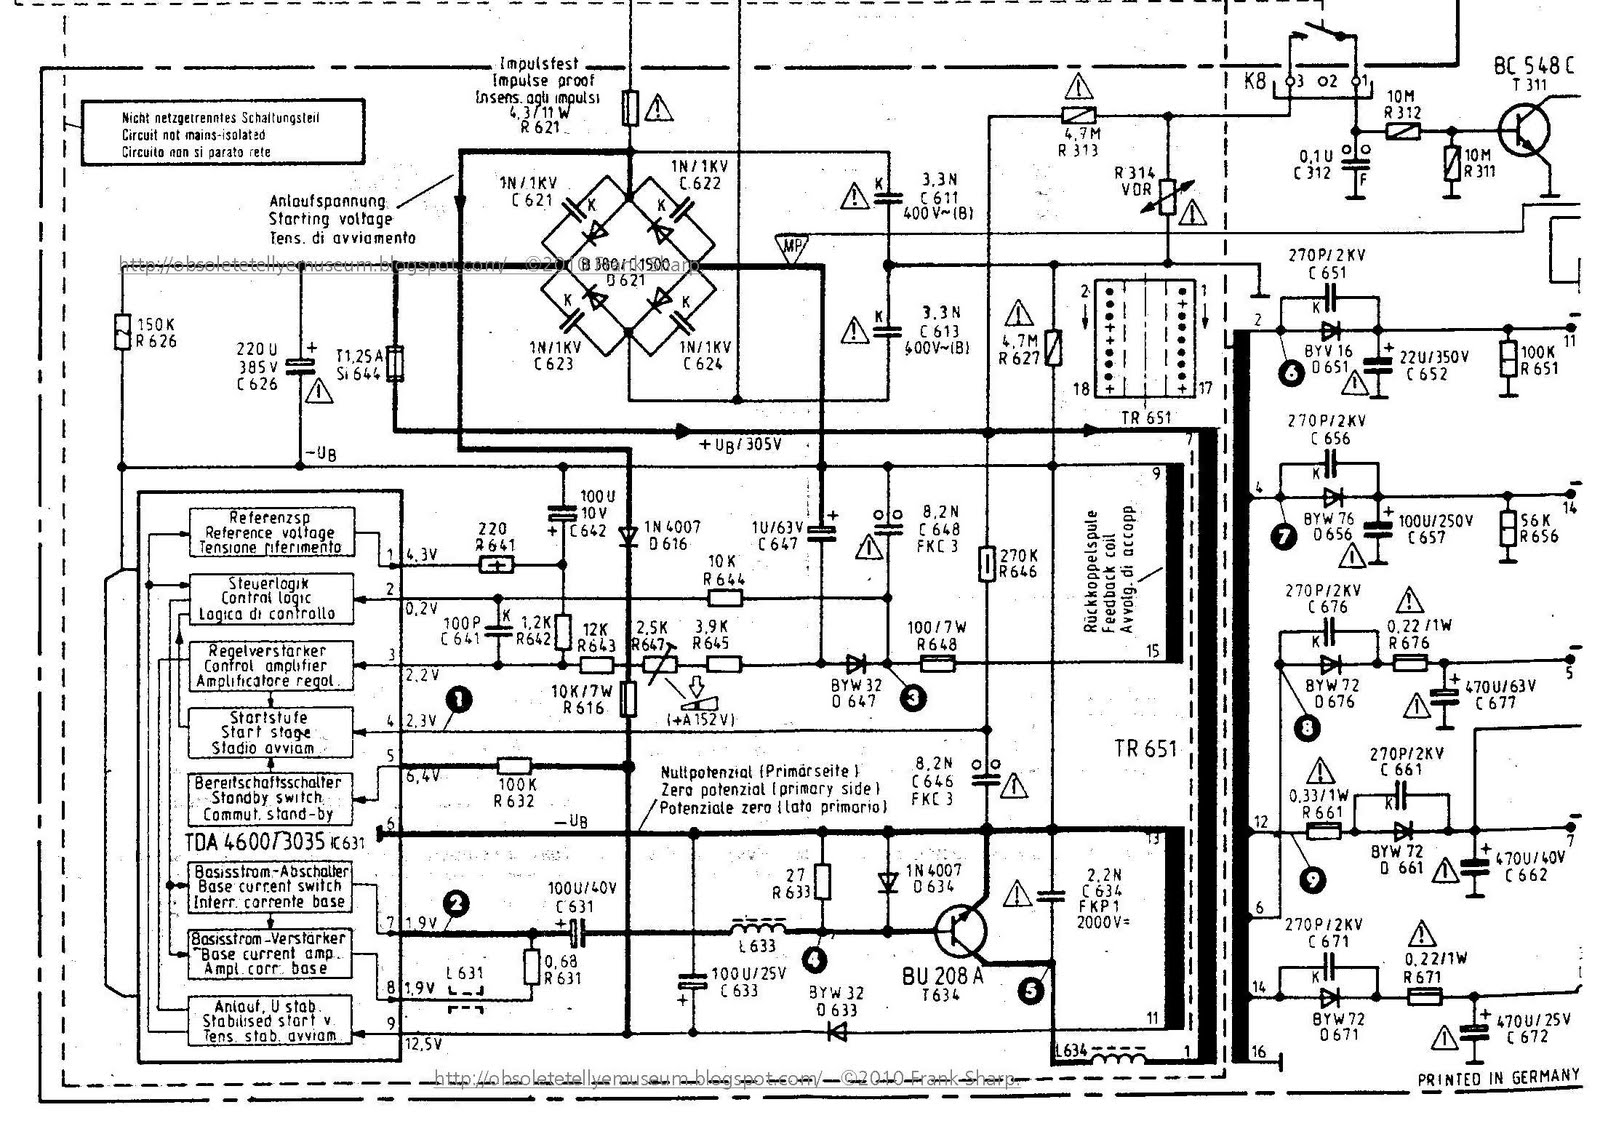 small resolution of ifb washing machine motor wiring diagram wiring library rh 4 evitta de whirlpool washing machine model numbers whirlpool washing machine wiring diagram